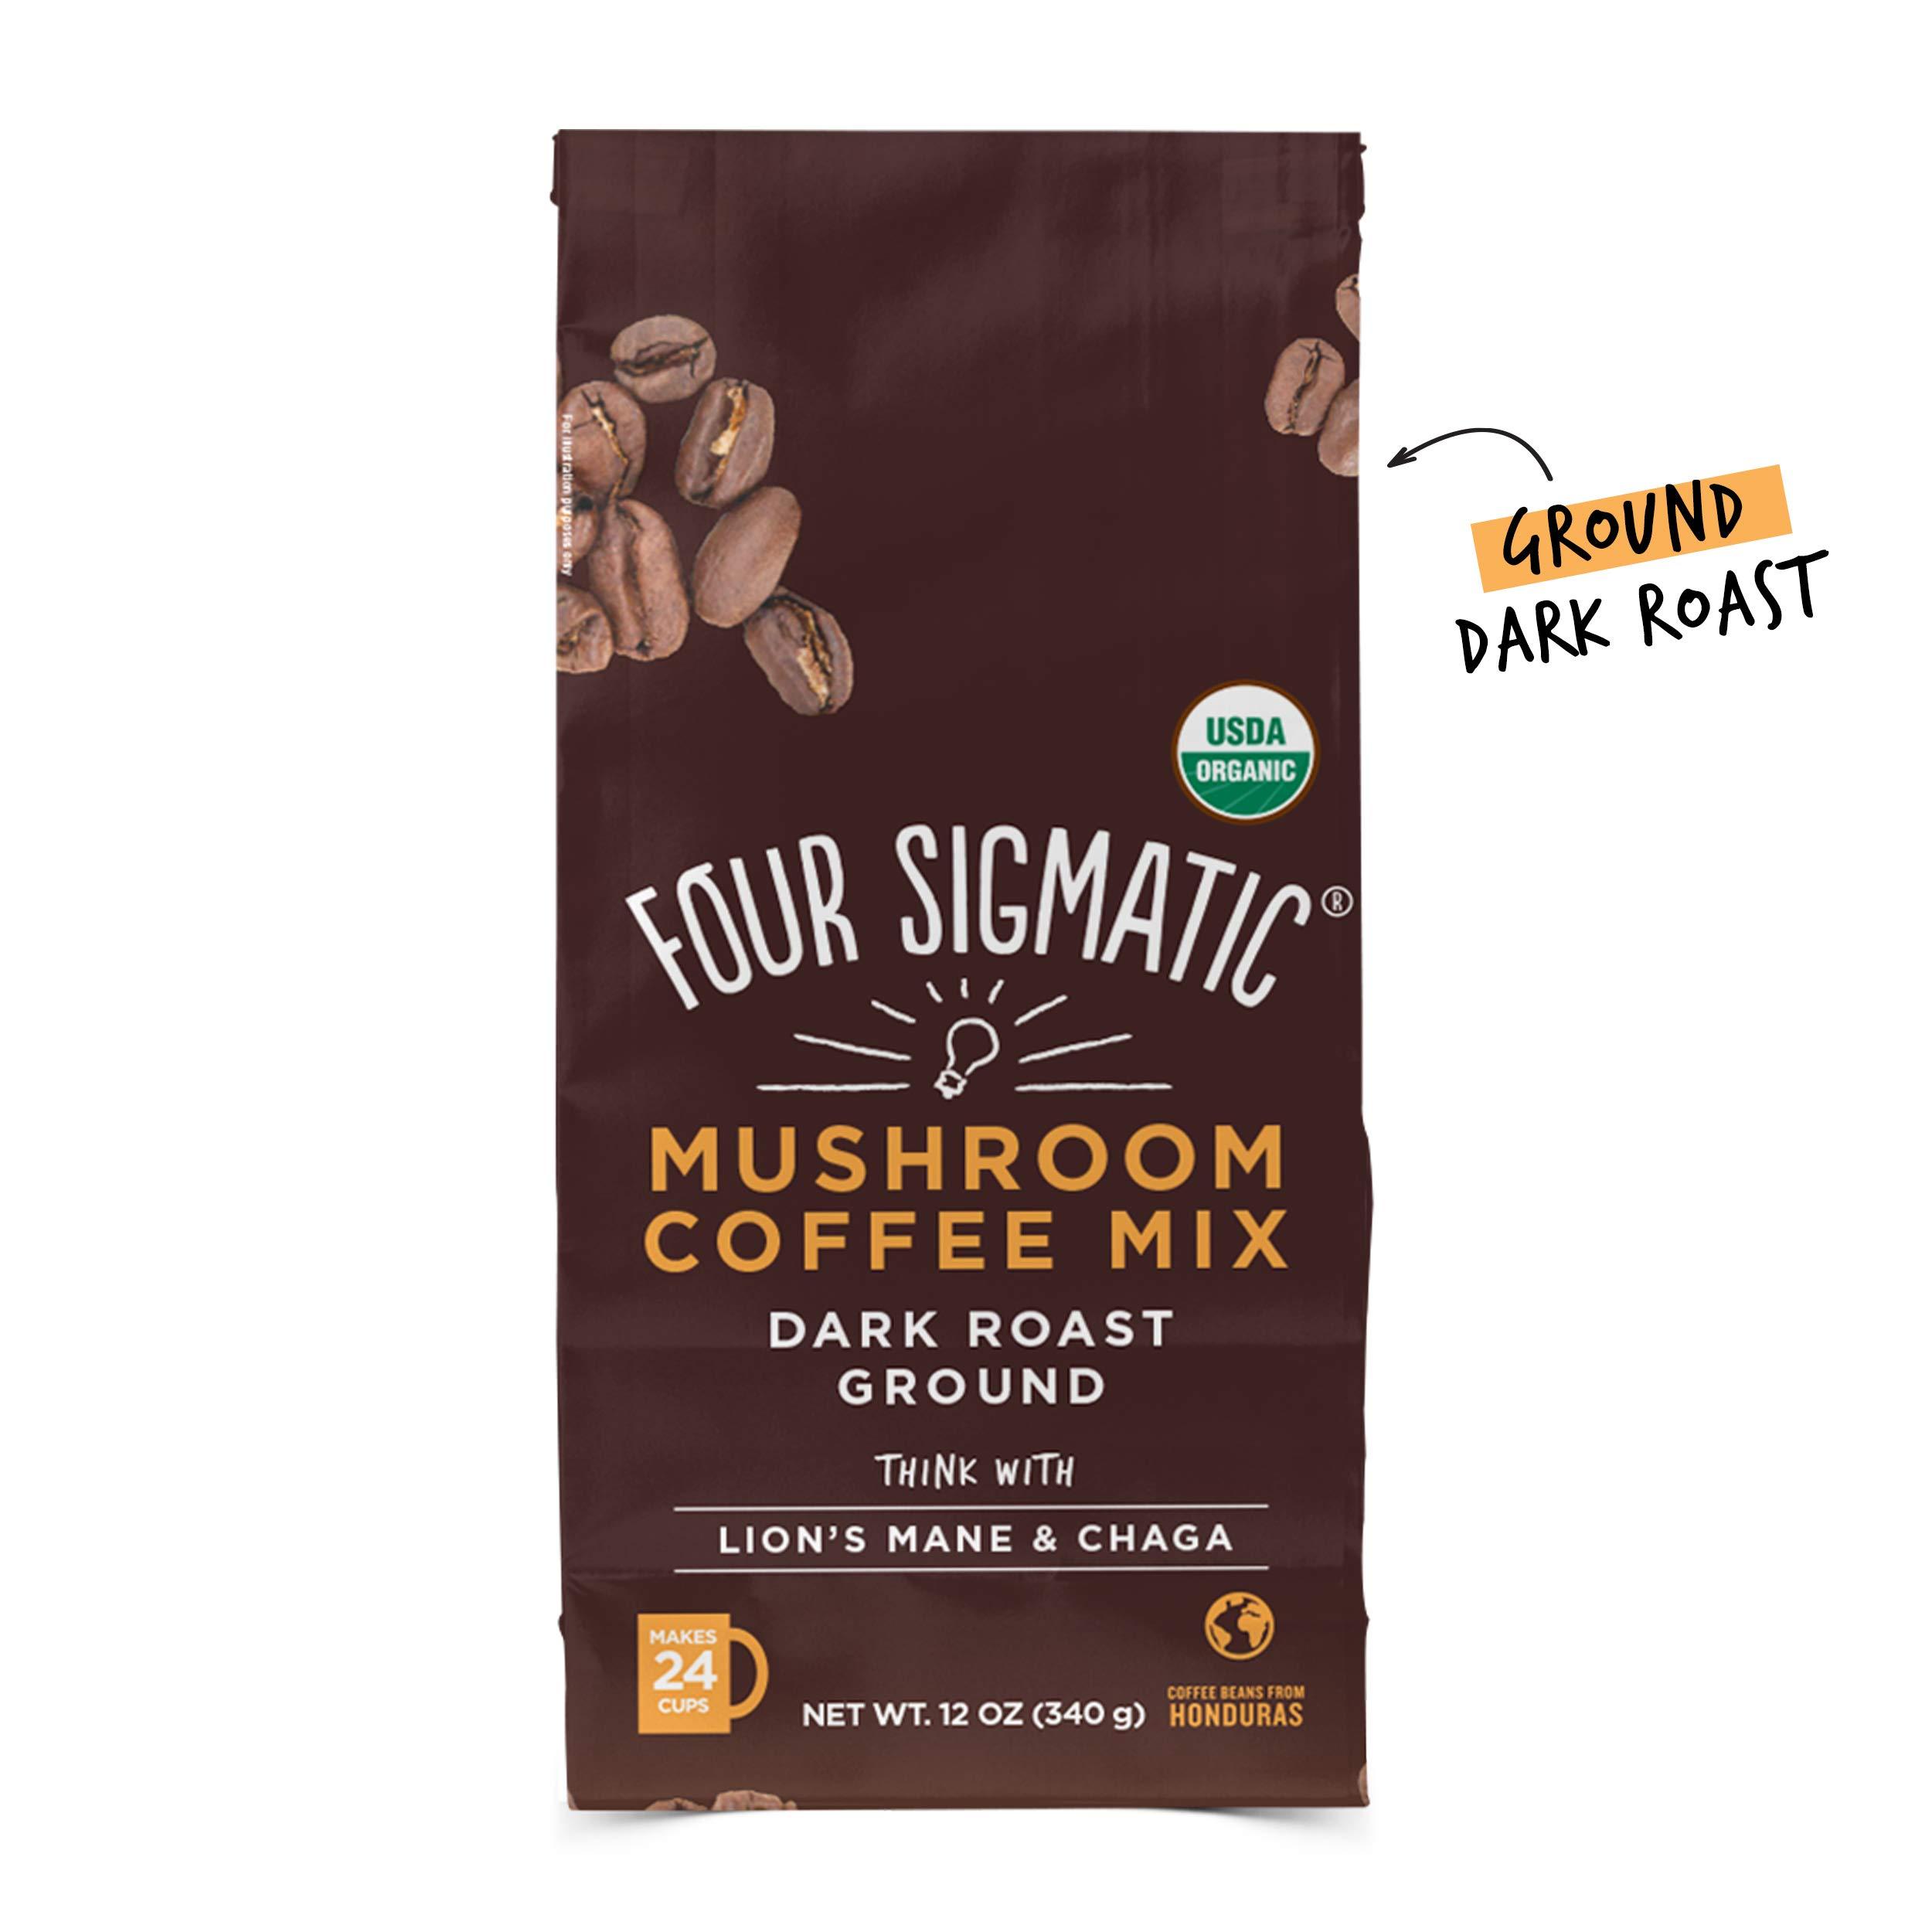 Four Sigmatic Mushroom Ground Coffee - USDA Organic and Fair Trade Coffee with Lions Mane and Mushroom Powder - Focus, Wellness - Vegan, Paleo - 12 Oz - Dark Roast by Four Sigmatic